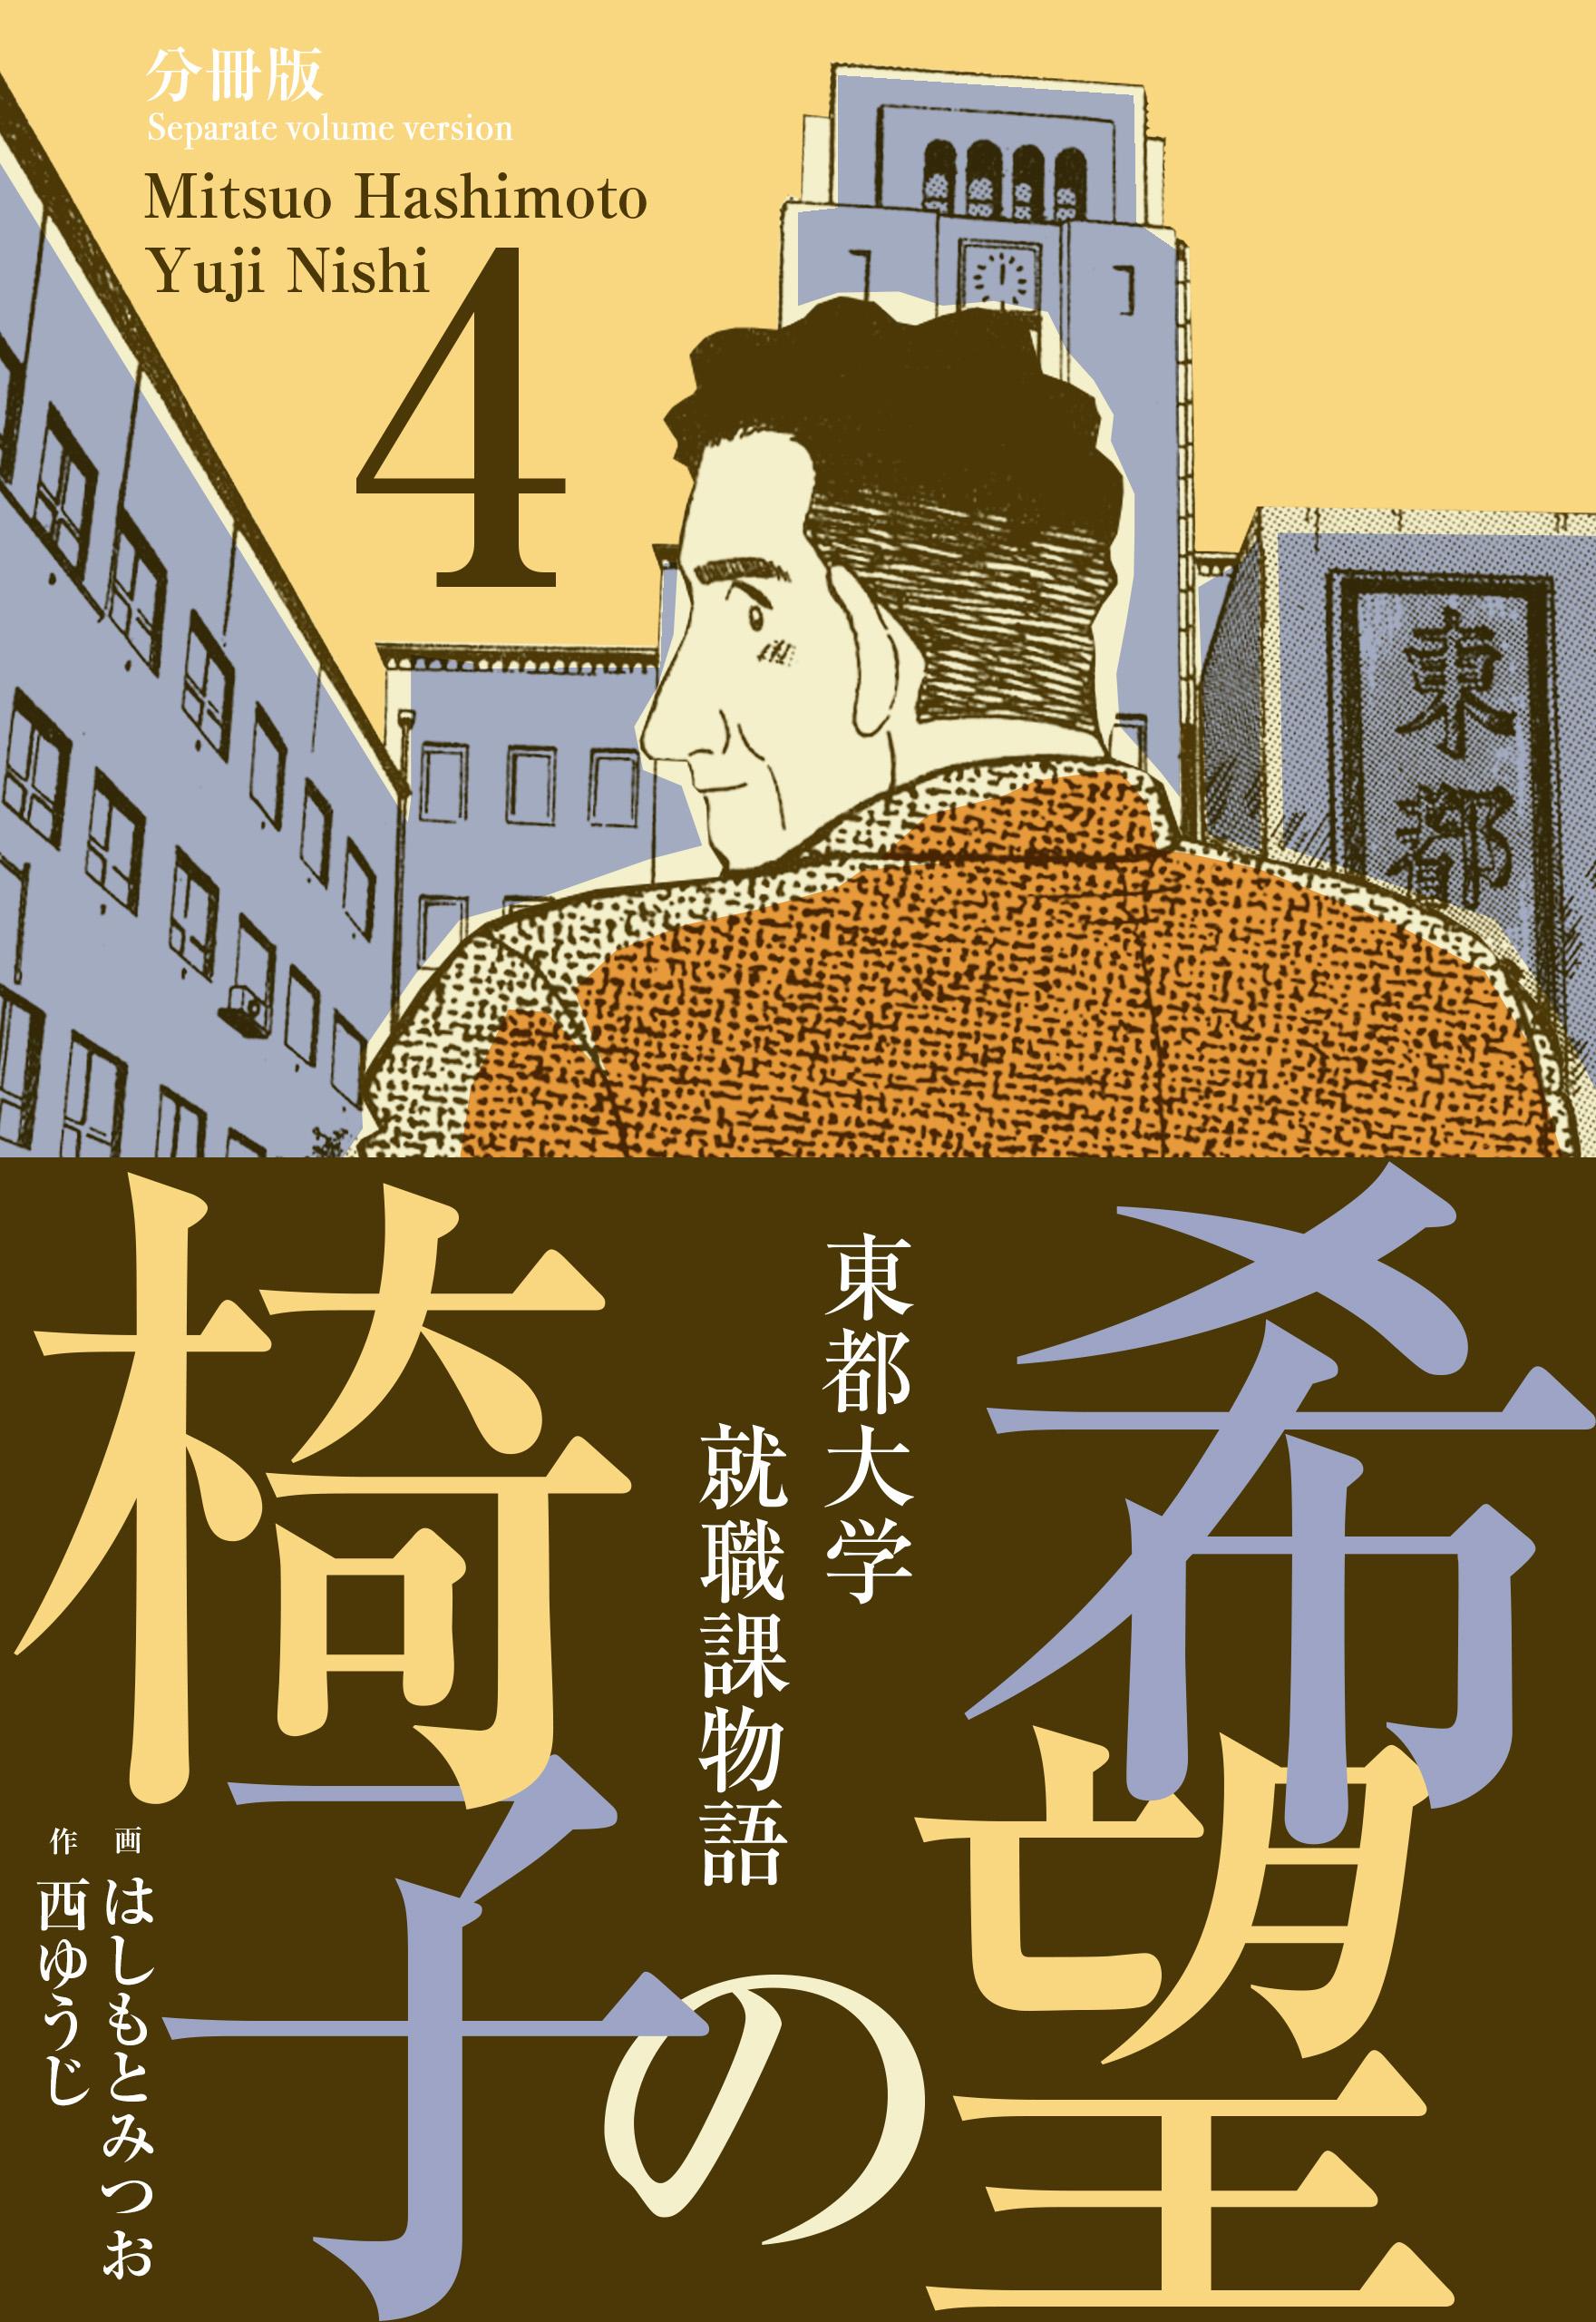 希望の椅子【分冊版】(第4巻)